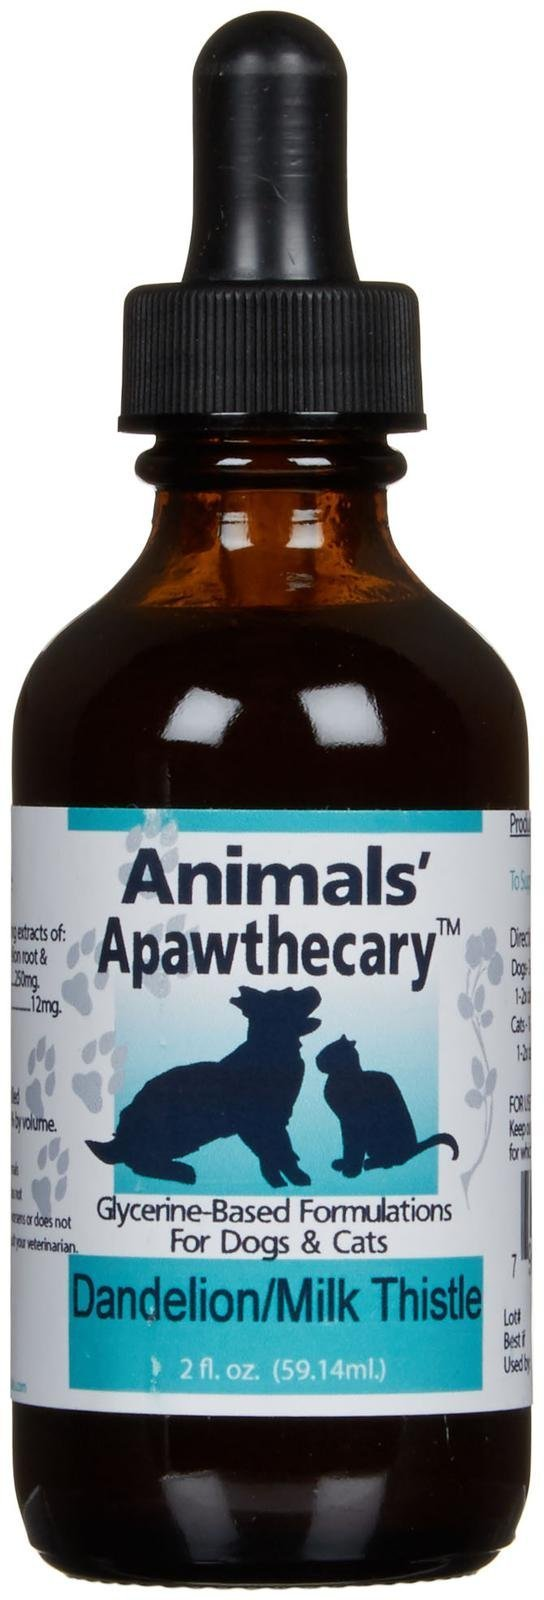 Animal Essentials Liver Defense Dandelion/Milk Thistle 2 fl. oz'' (Packaging May Vary) by Animal Essentials